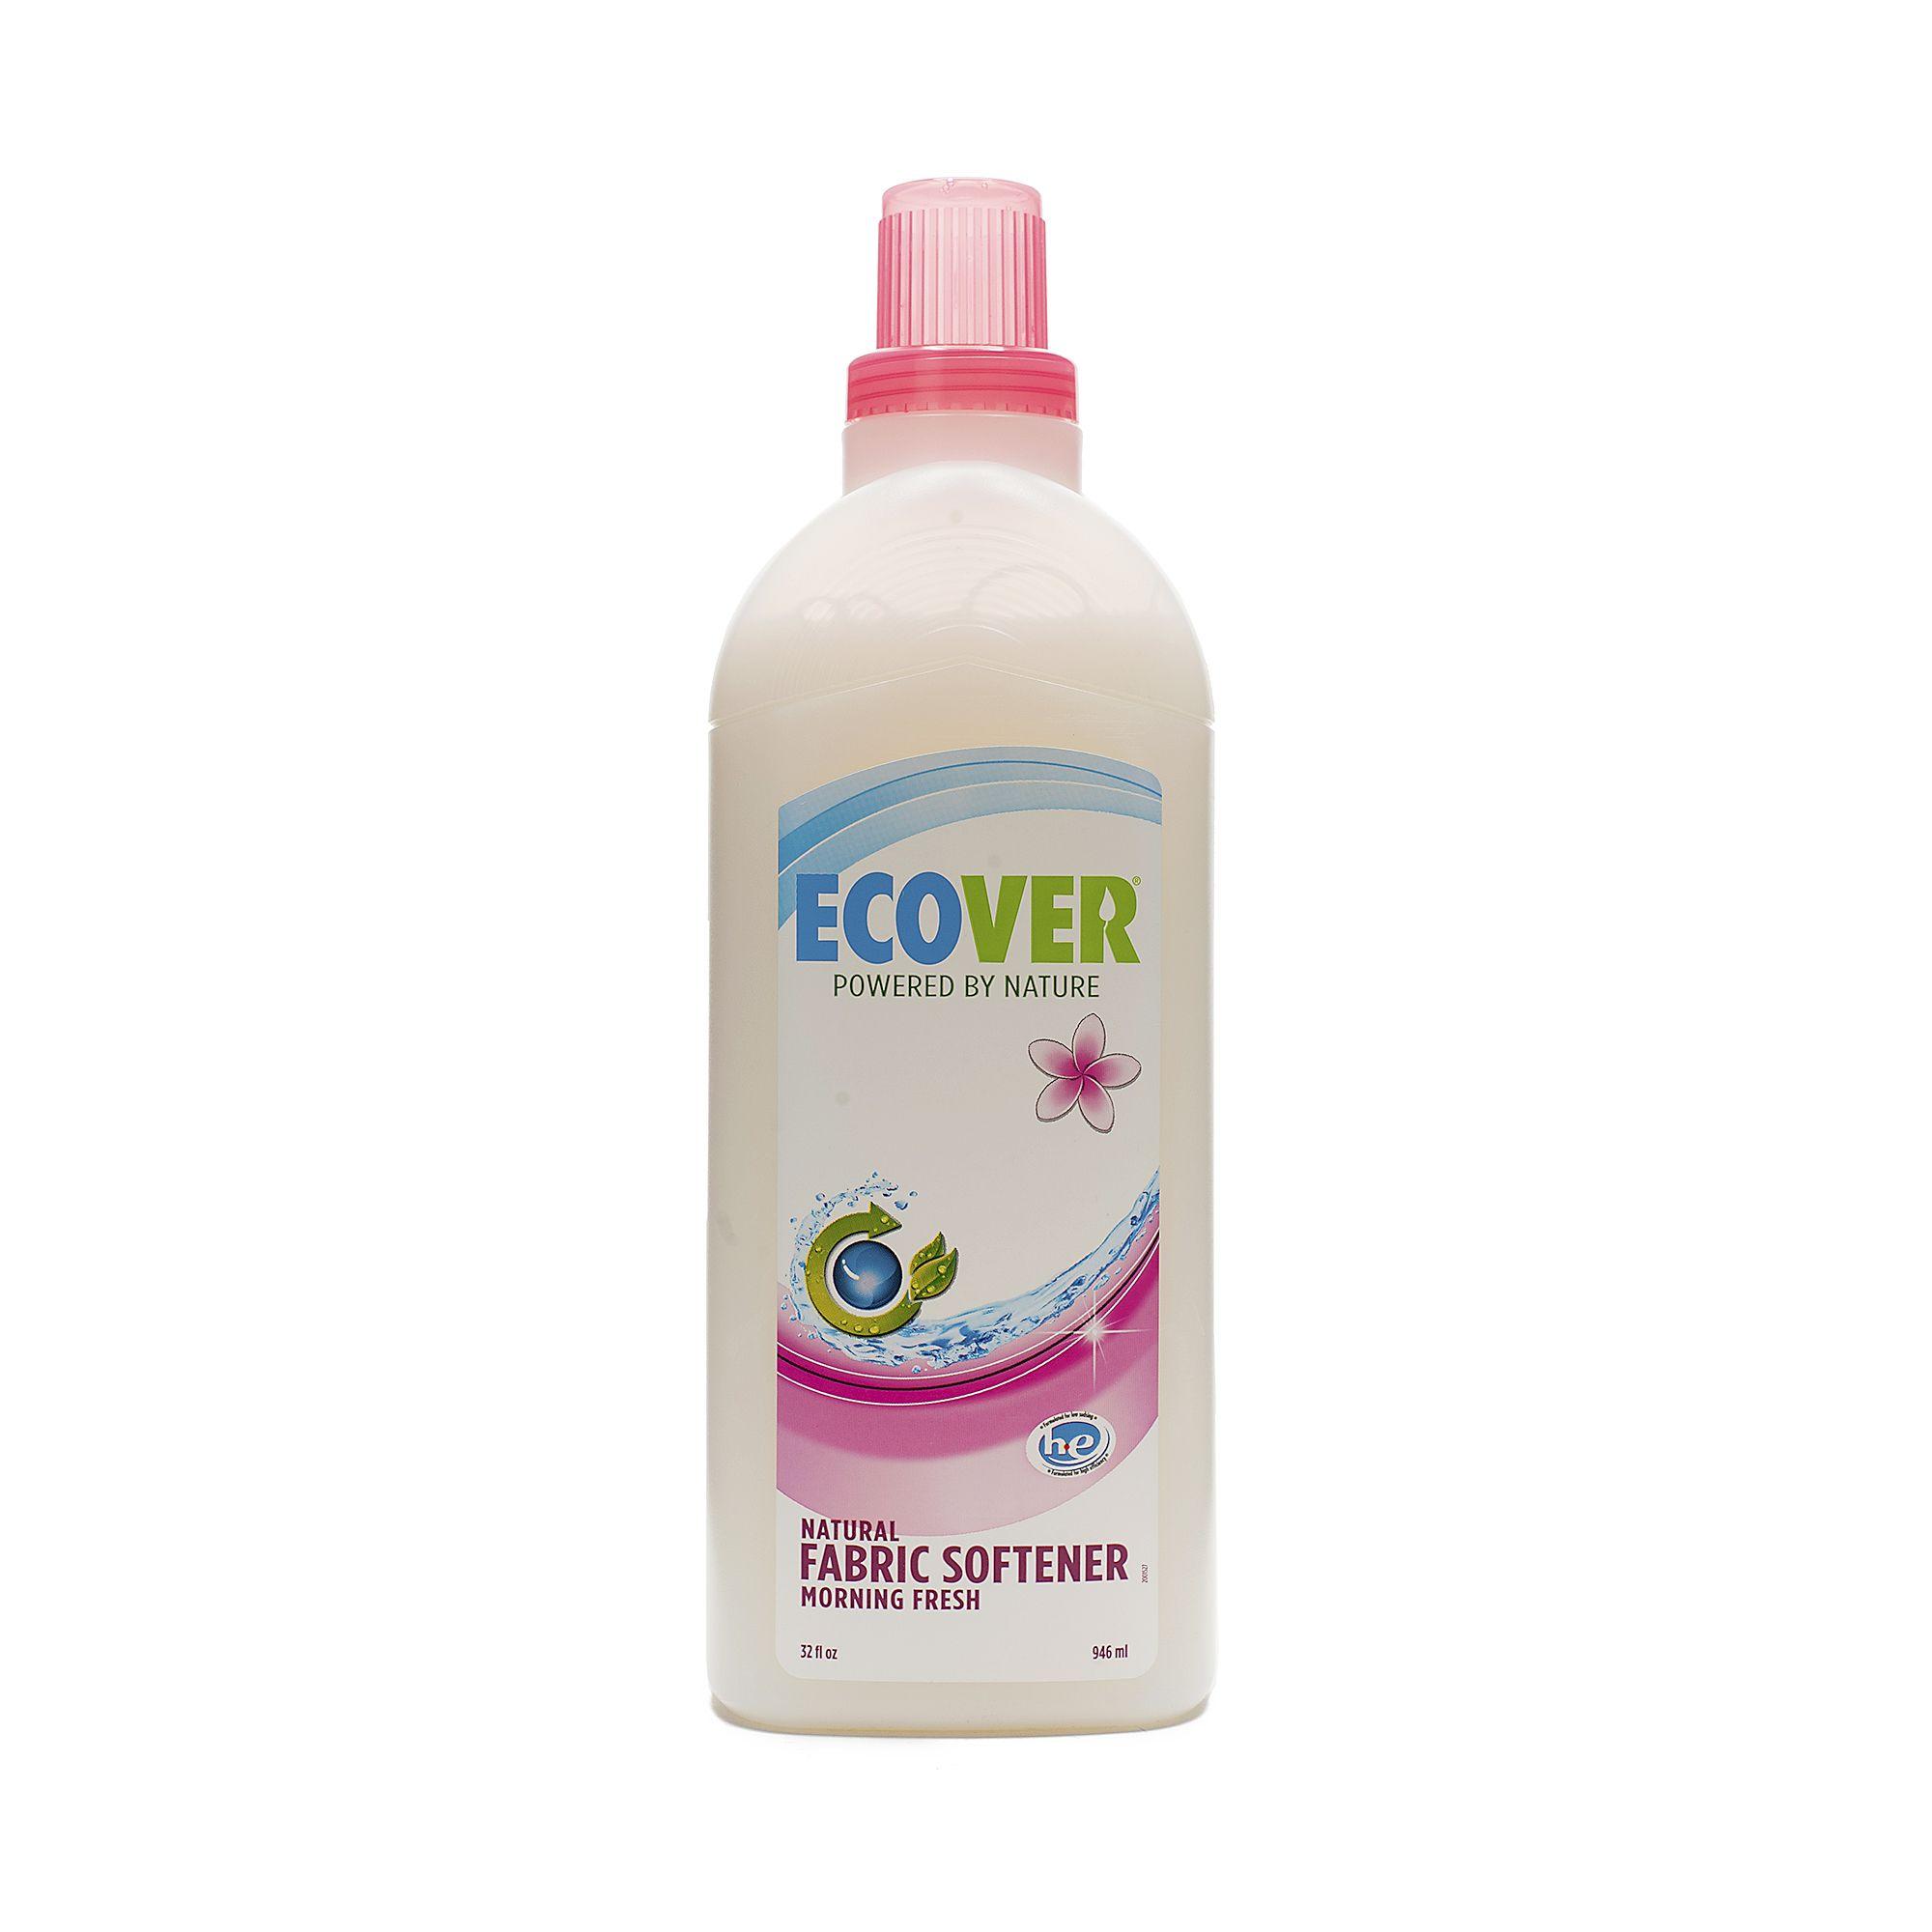 Ecover Morning Fresh Fabric Softener Fabric Softener